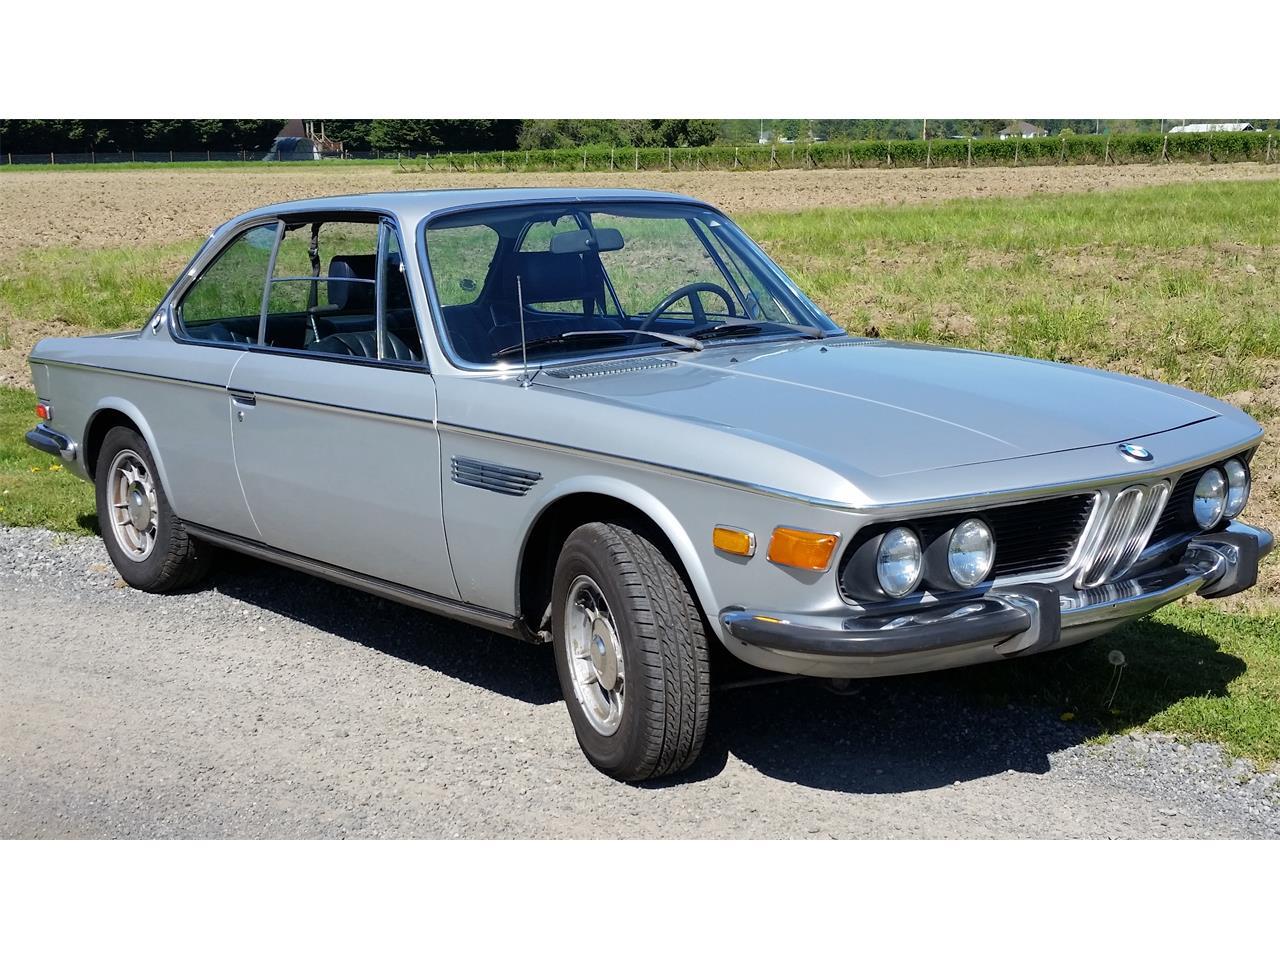 Bmw 3.0 Cs For Sale >> For Sale 1972 Bmw 3 0cs In Carnation Washington